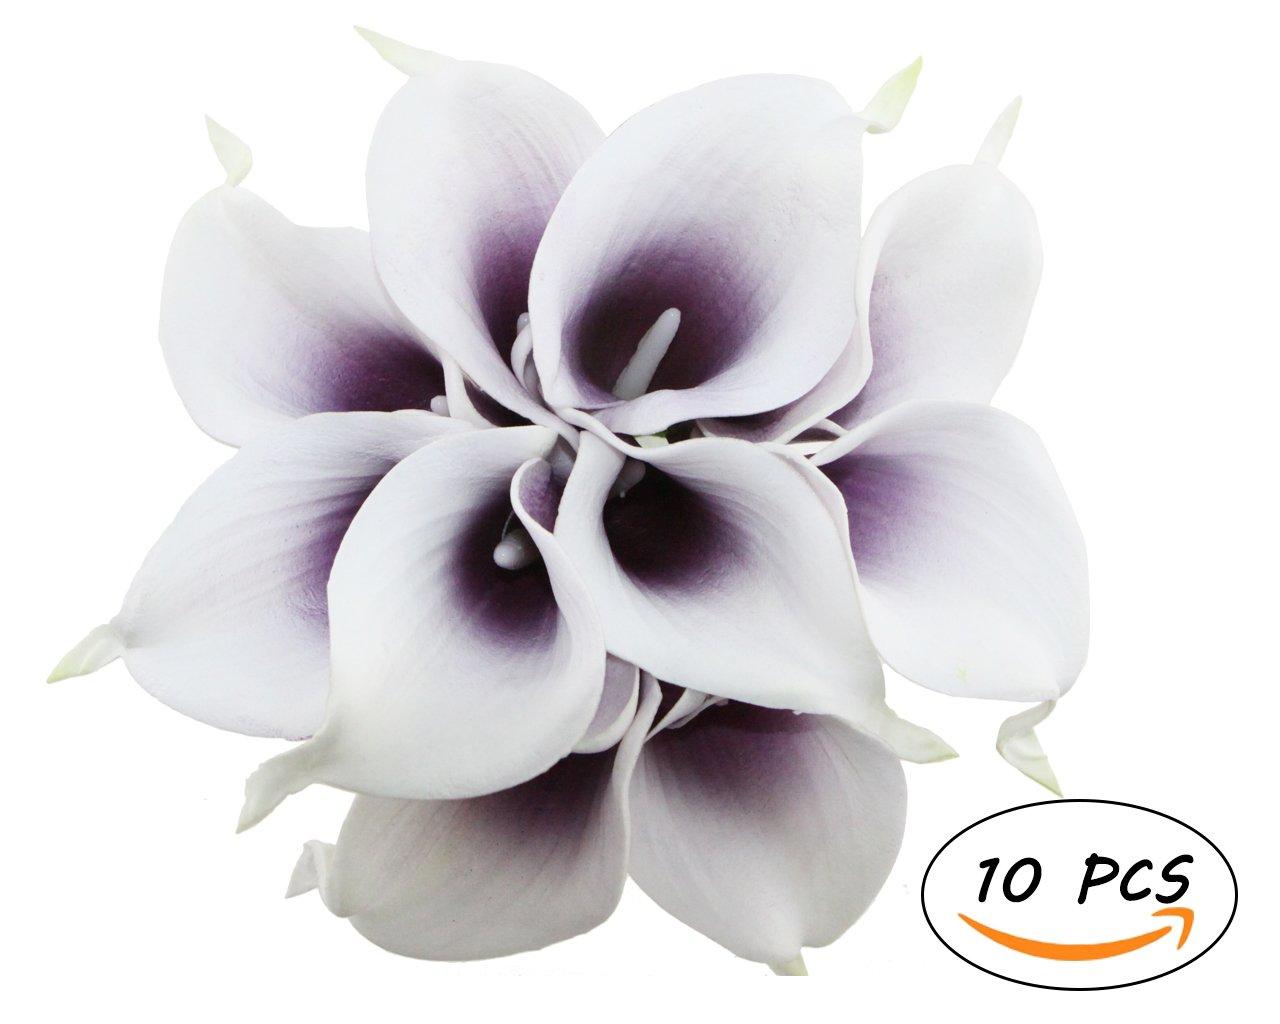 Bunch of 10人工ピカソカラーリリー柄花ブーケウェディングパーティーホームガーデンレストラン装飾バレンタインギフト( purple-white ) B07C911M4K